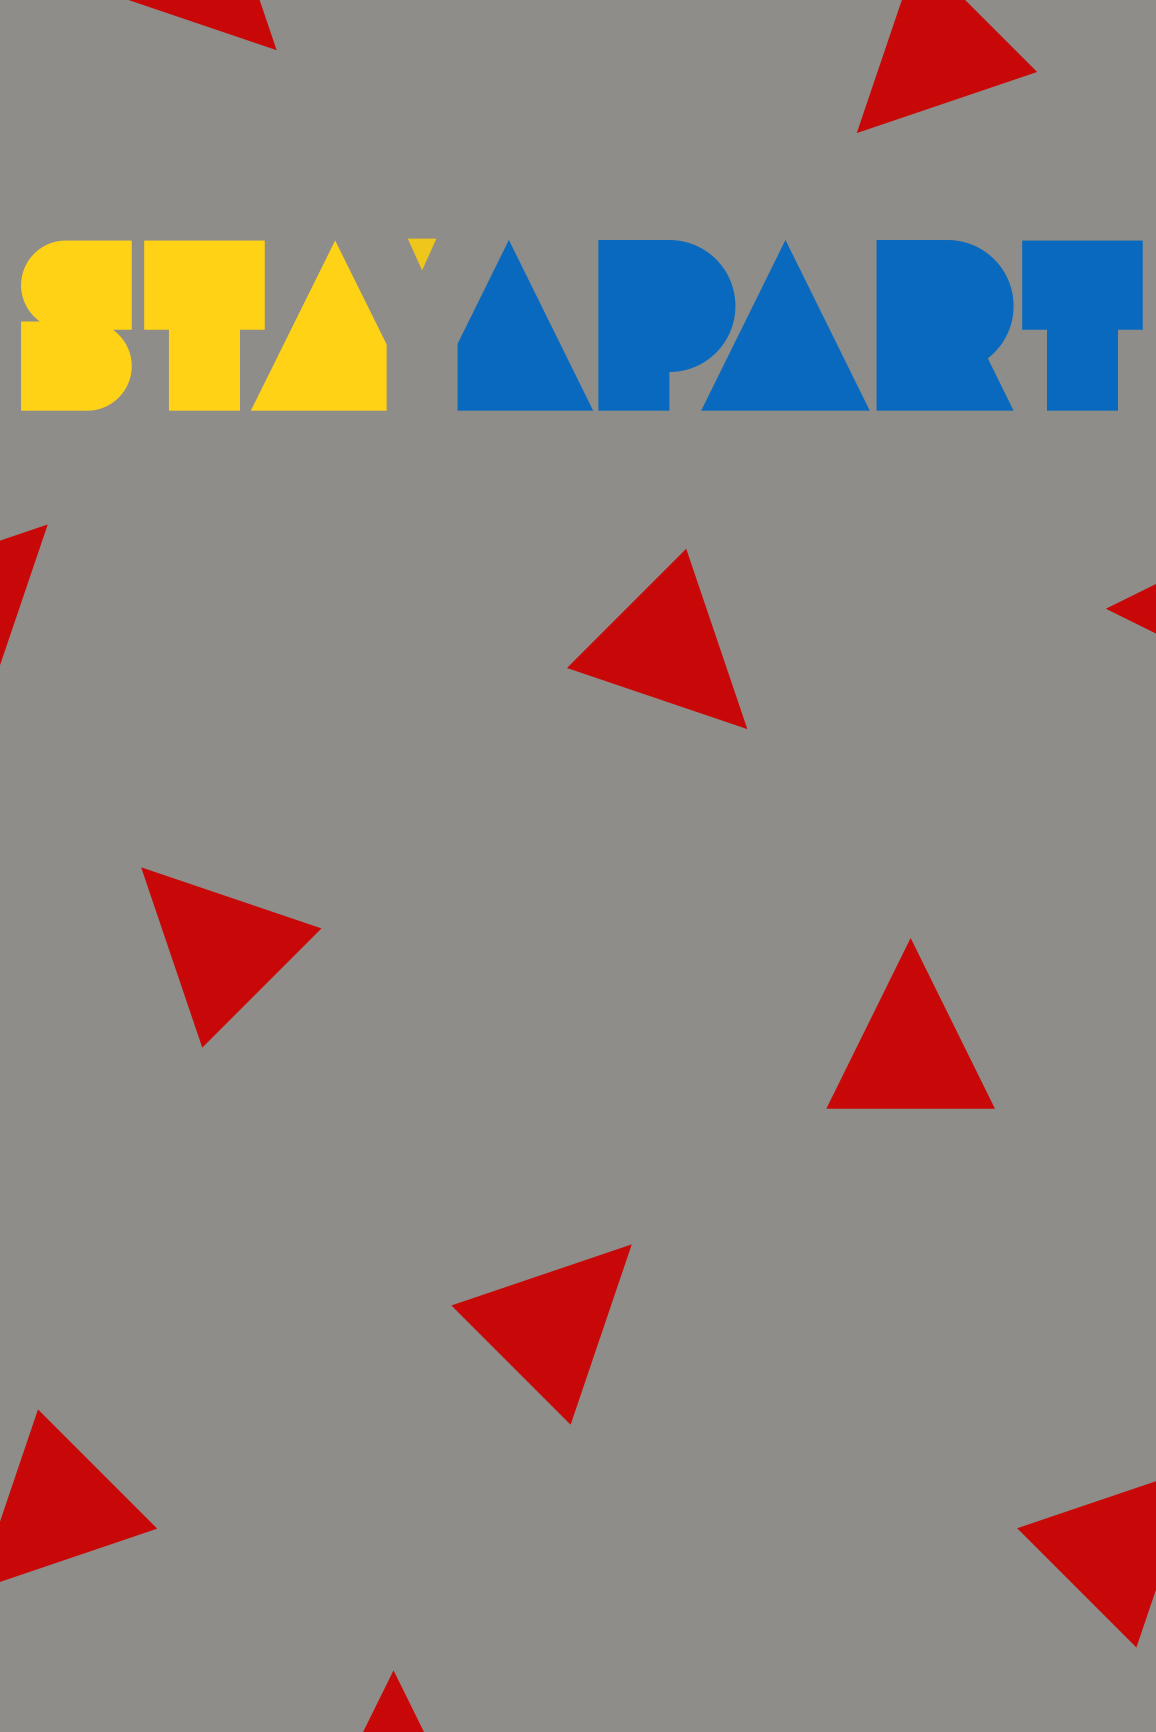 Stay Apart